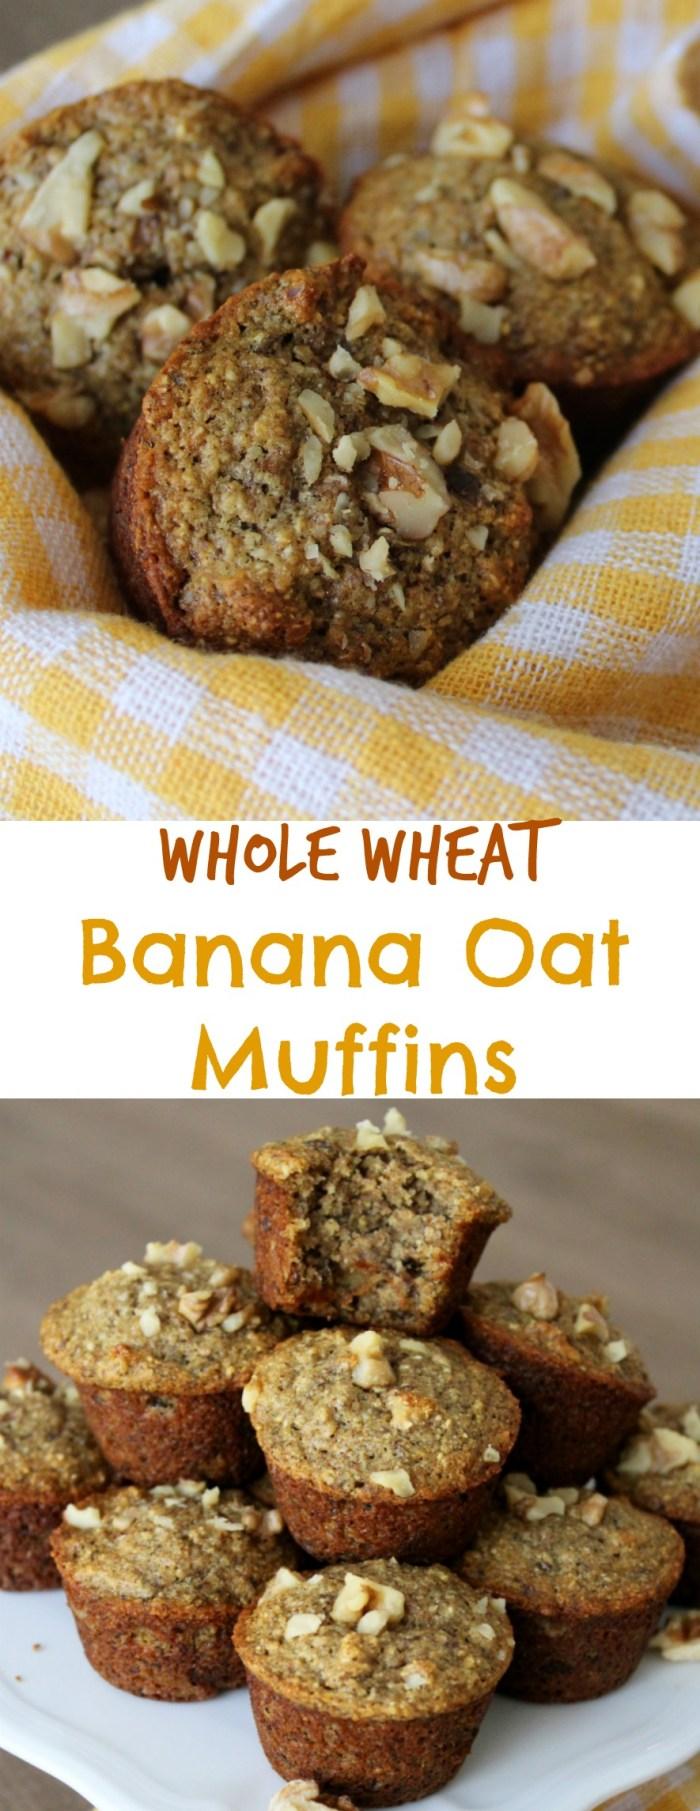 Whole Wheat Banana Oat Muffins (Vegan) - Insightful Bite